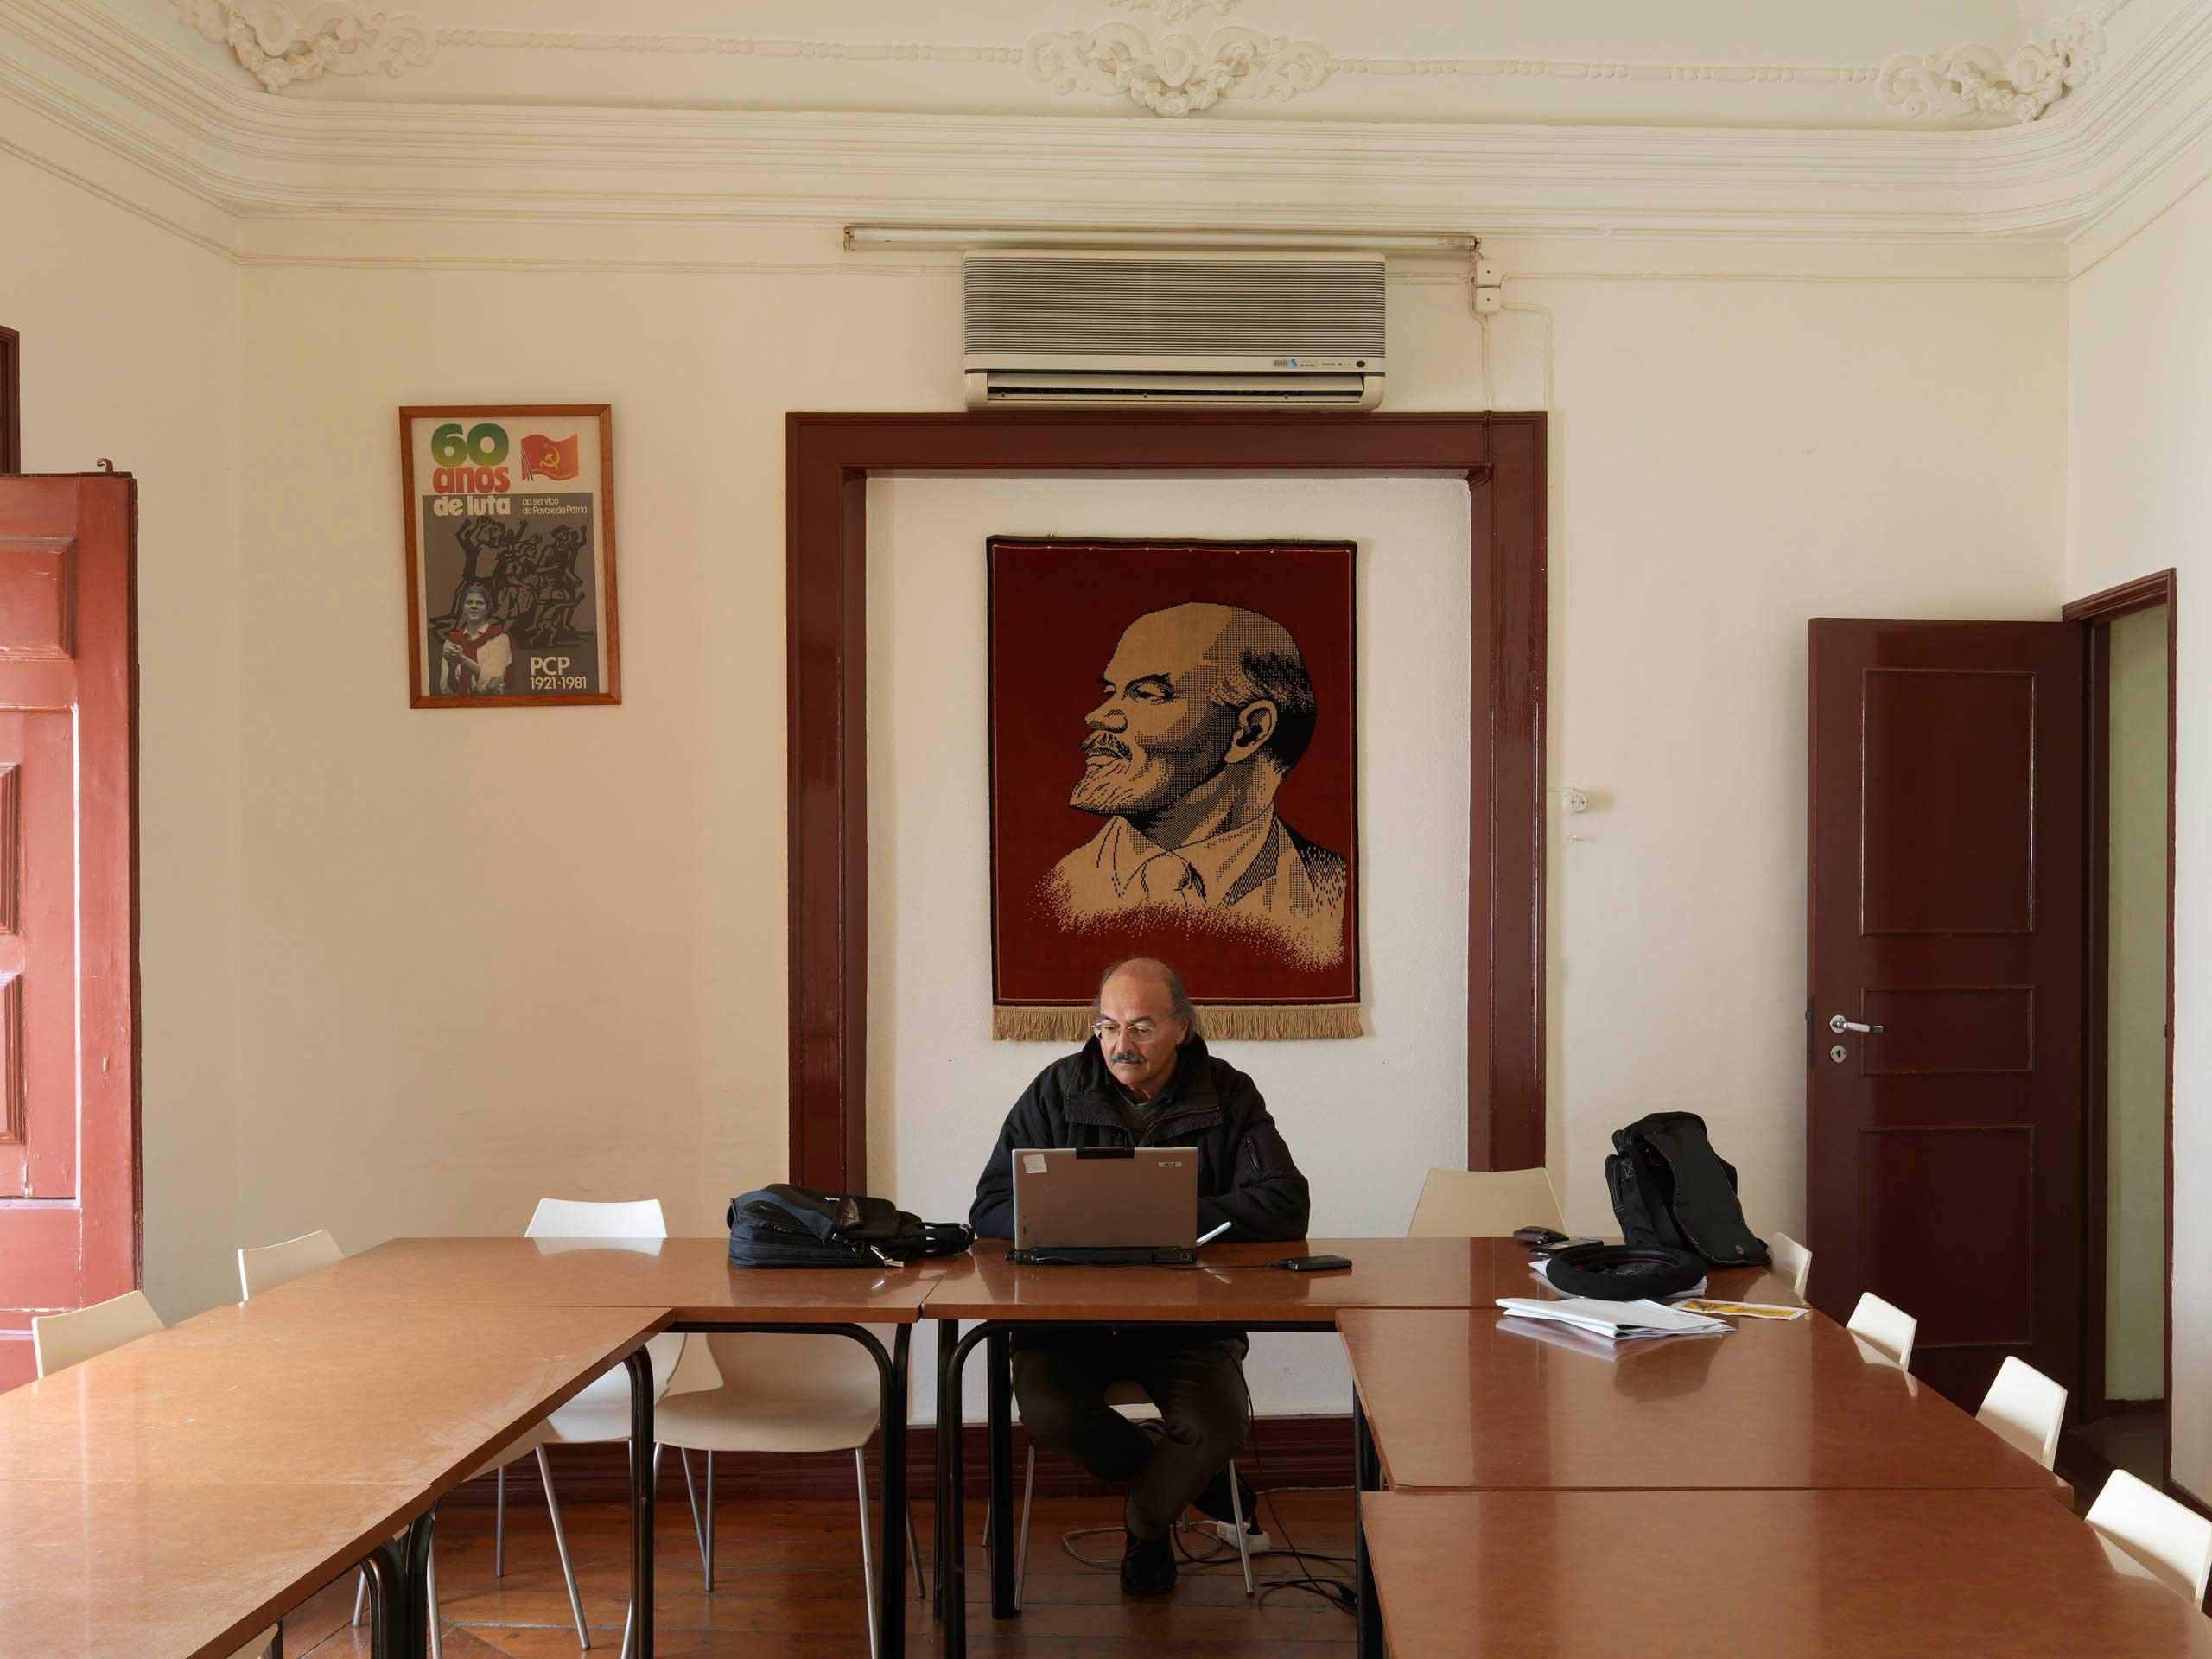 Antonio Gavela, member of the  Commisao Concelha do PCP Evora.  sits in the PCP office in Evora in Alentejo, Portugal. it is the former hardcore area of Reforma Agraria.